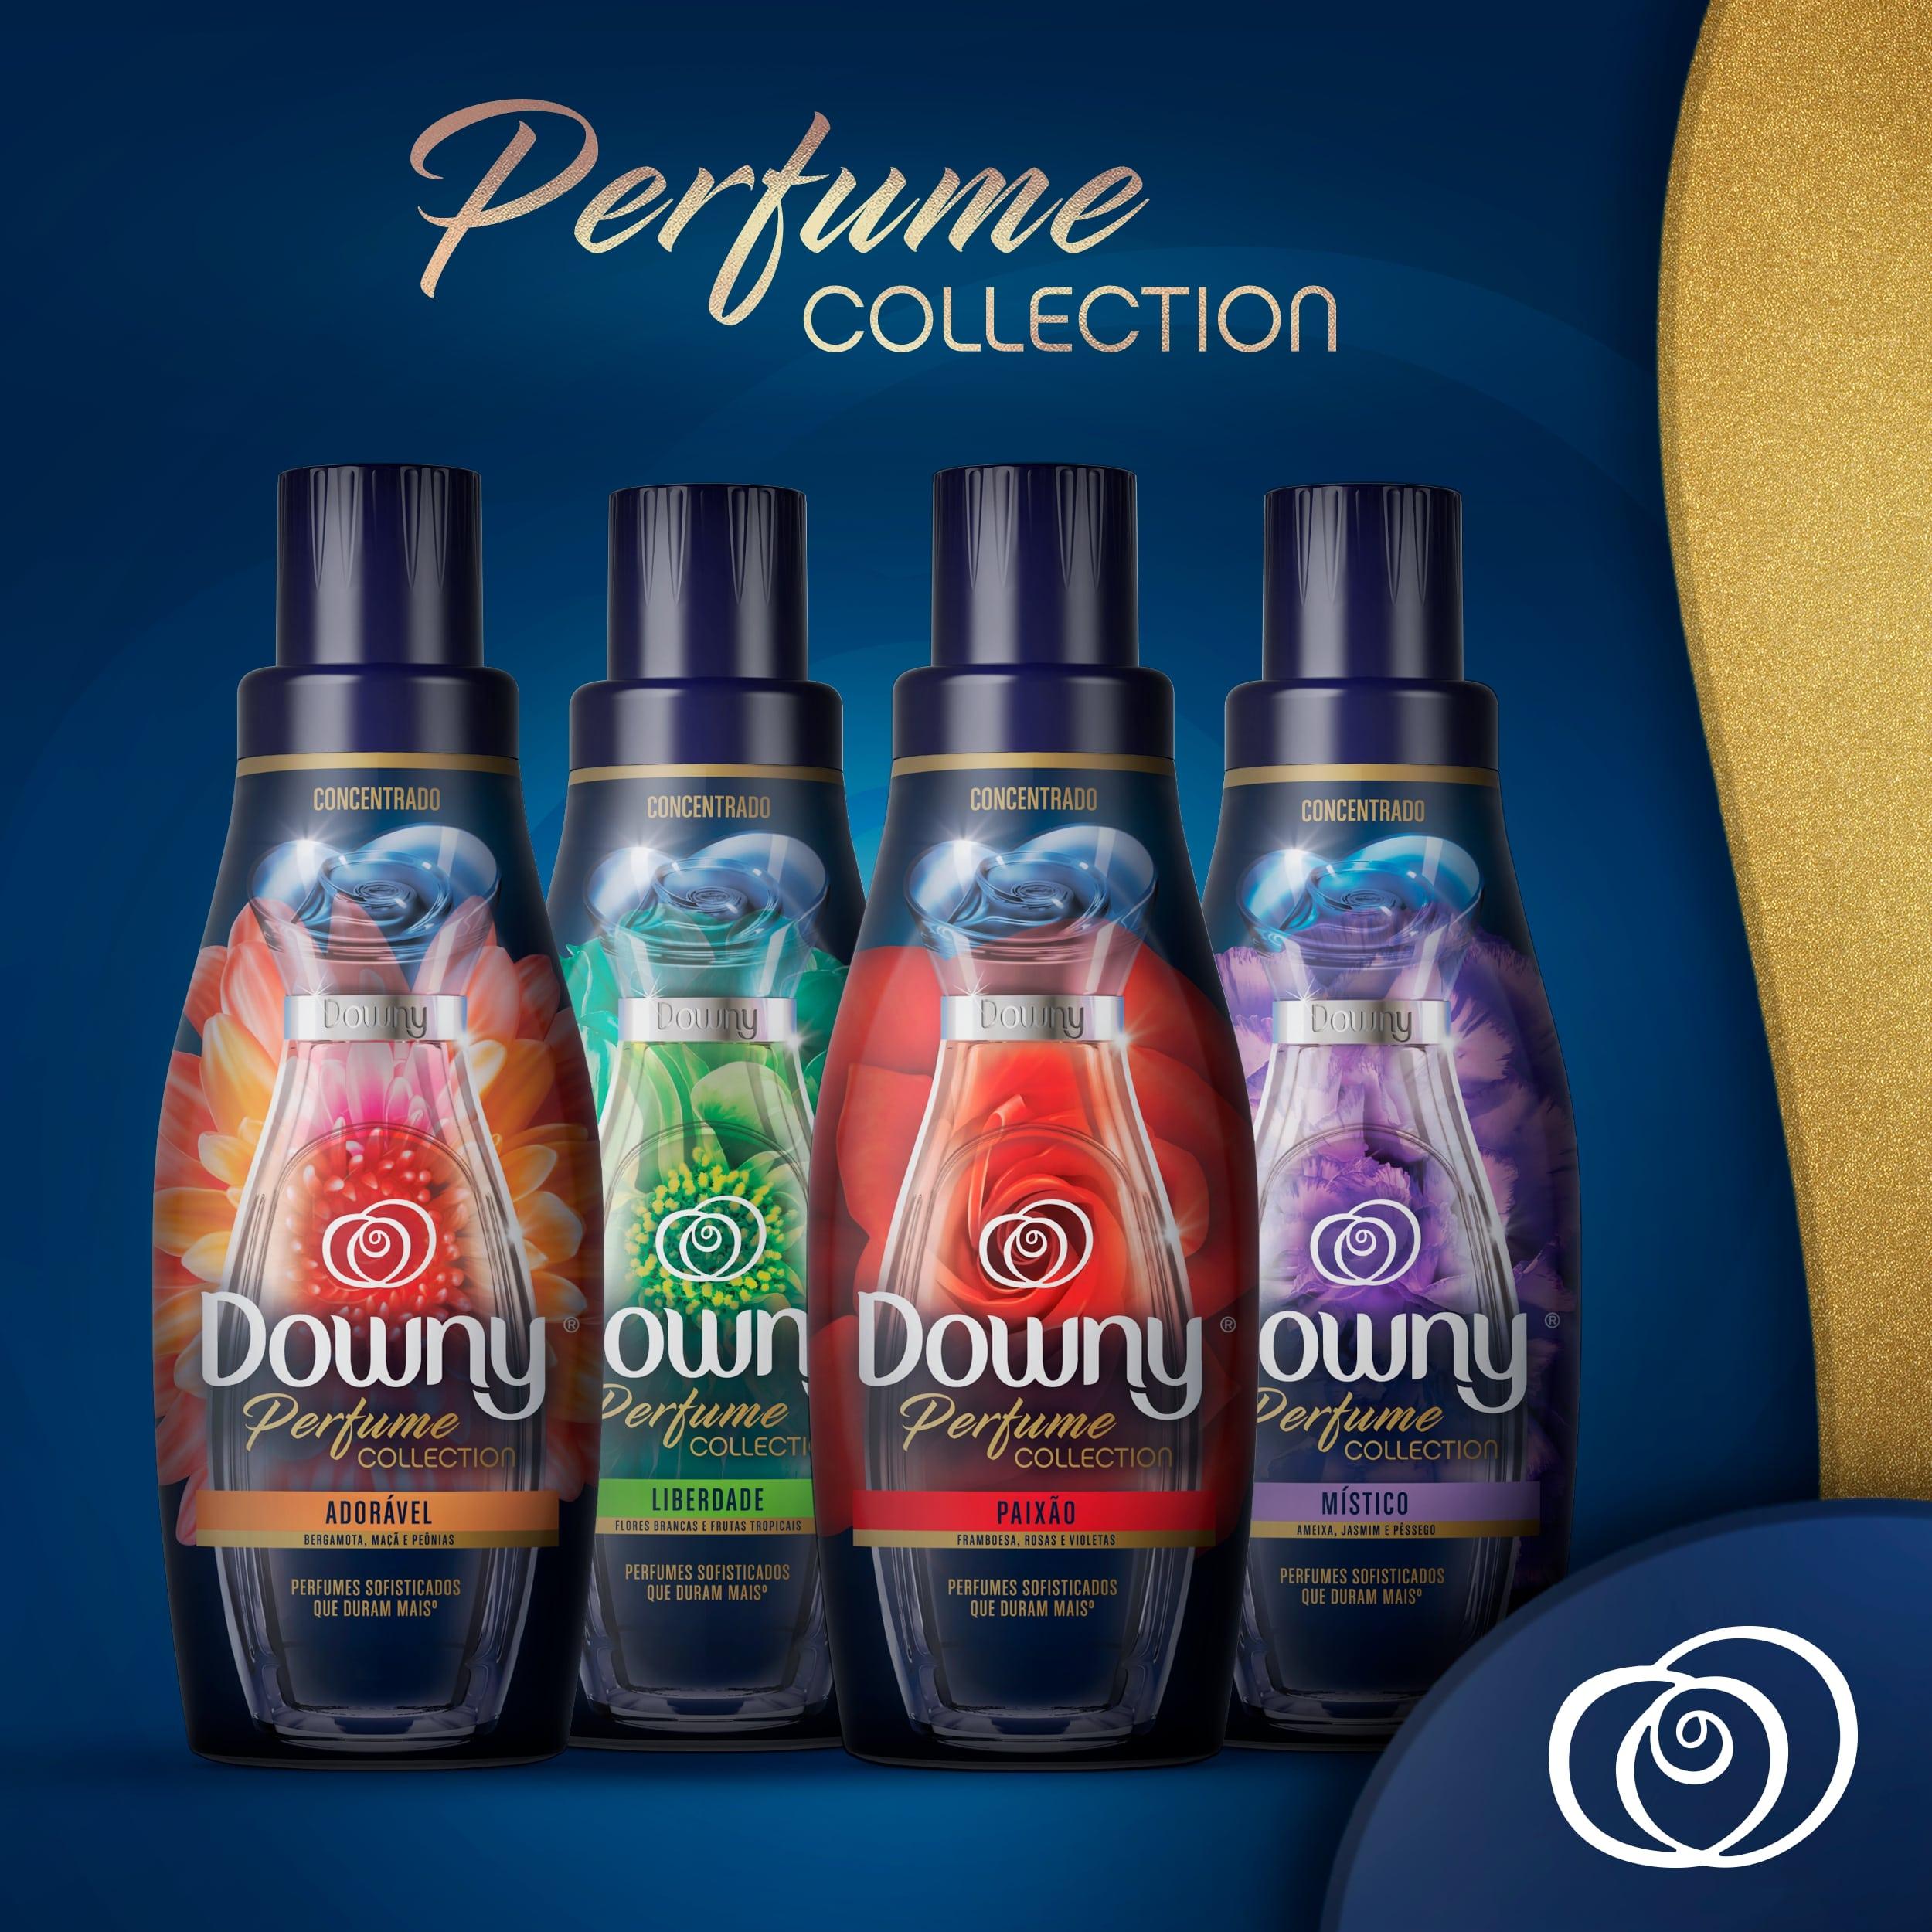 Amaciante Downy Perfume Collection Místico Secondary 04